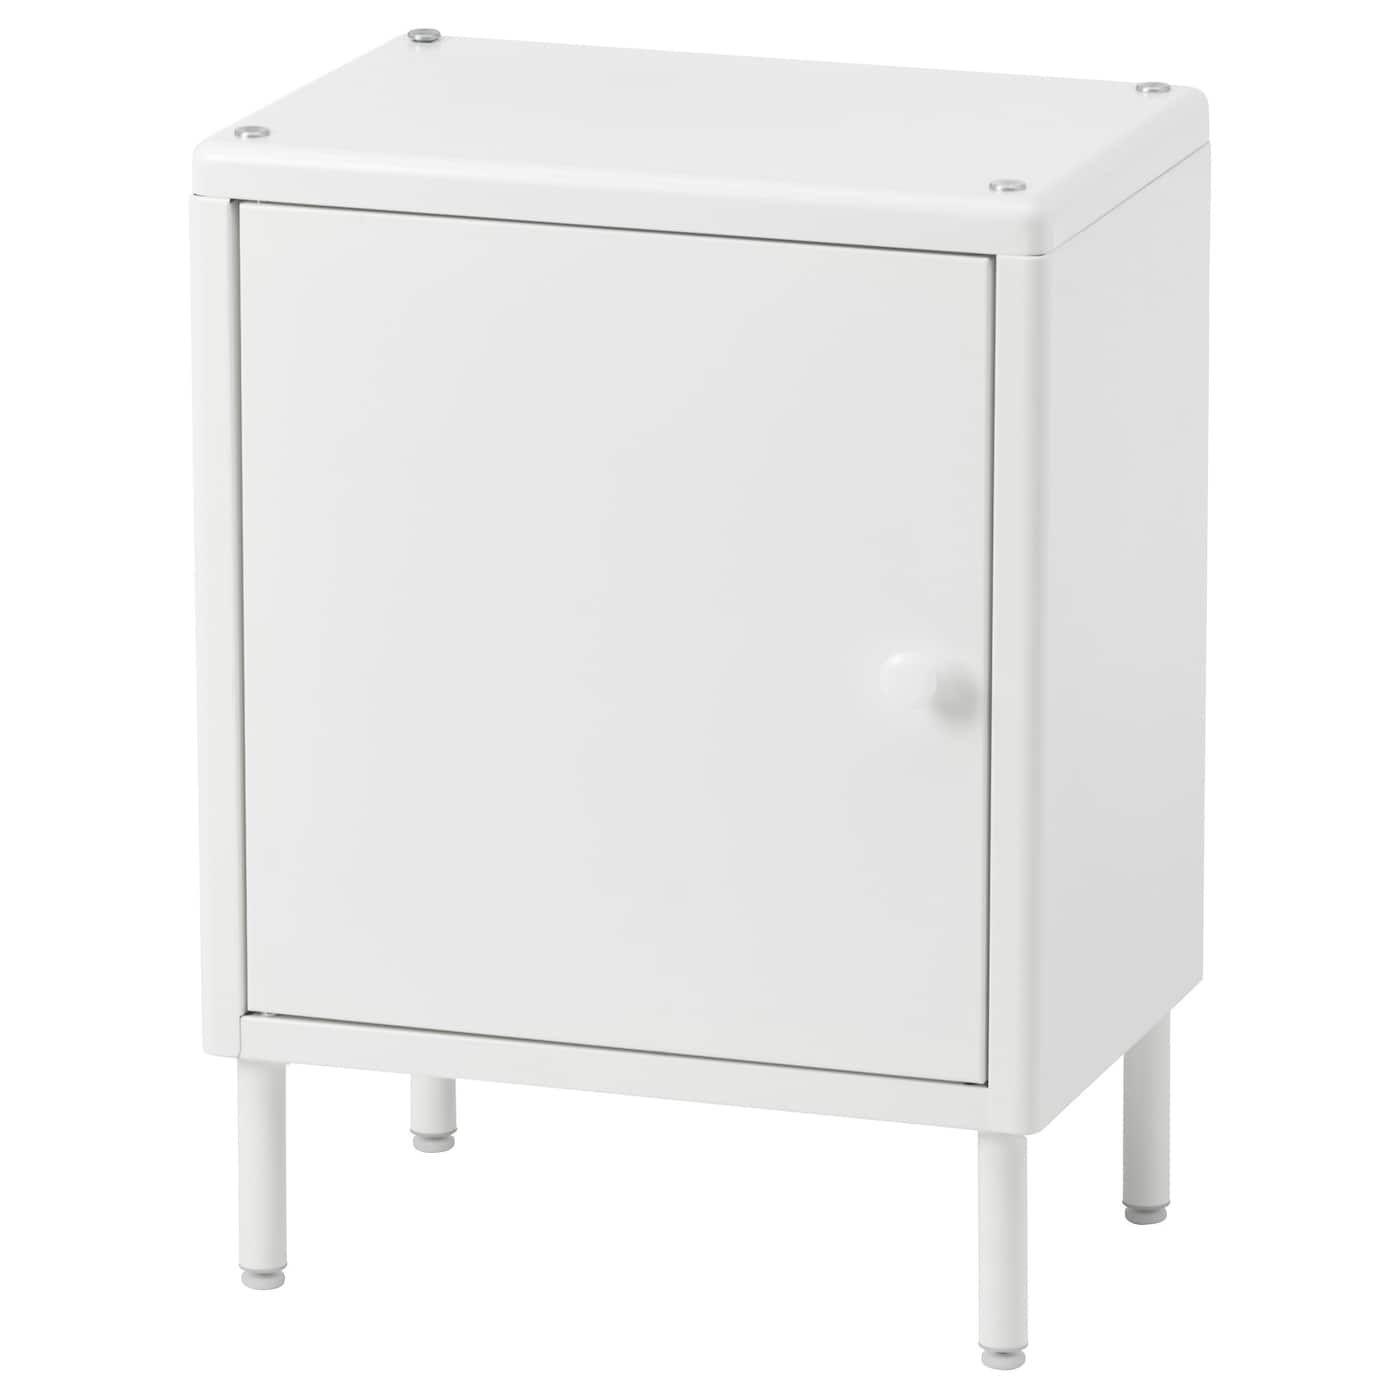 Dynan Cabinet With Door White 15 3 4x10 5 8x21 1 4 Cabinet Doors Bathroom Storage Hacks Bathroom Storage